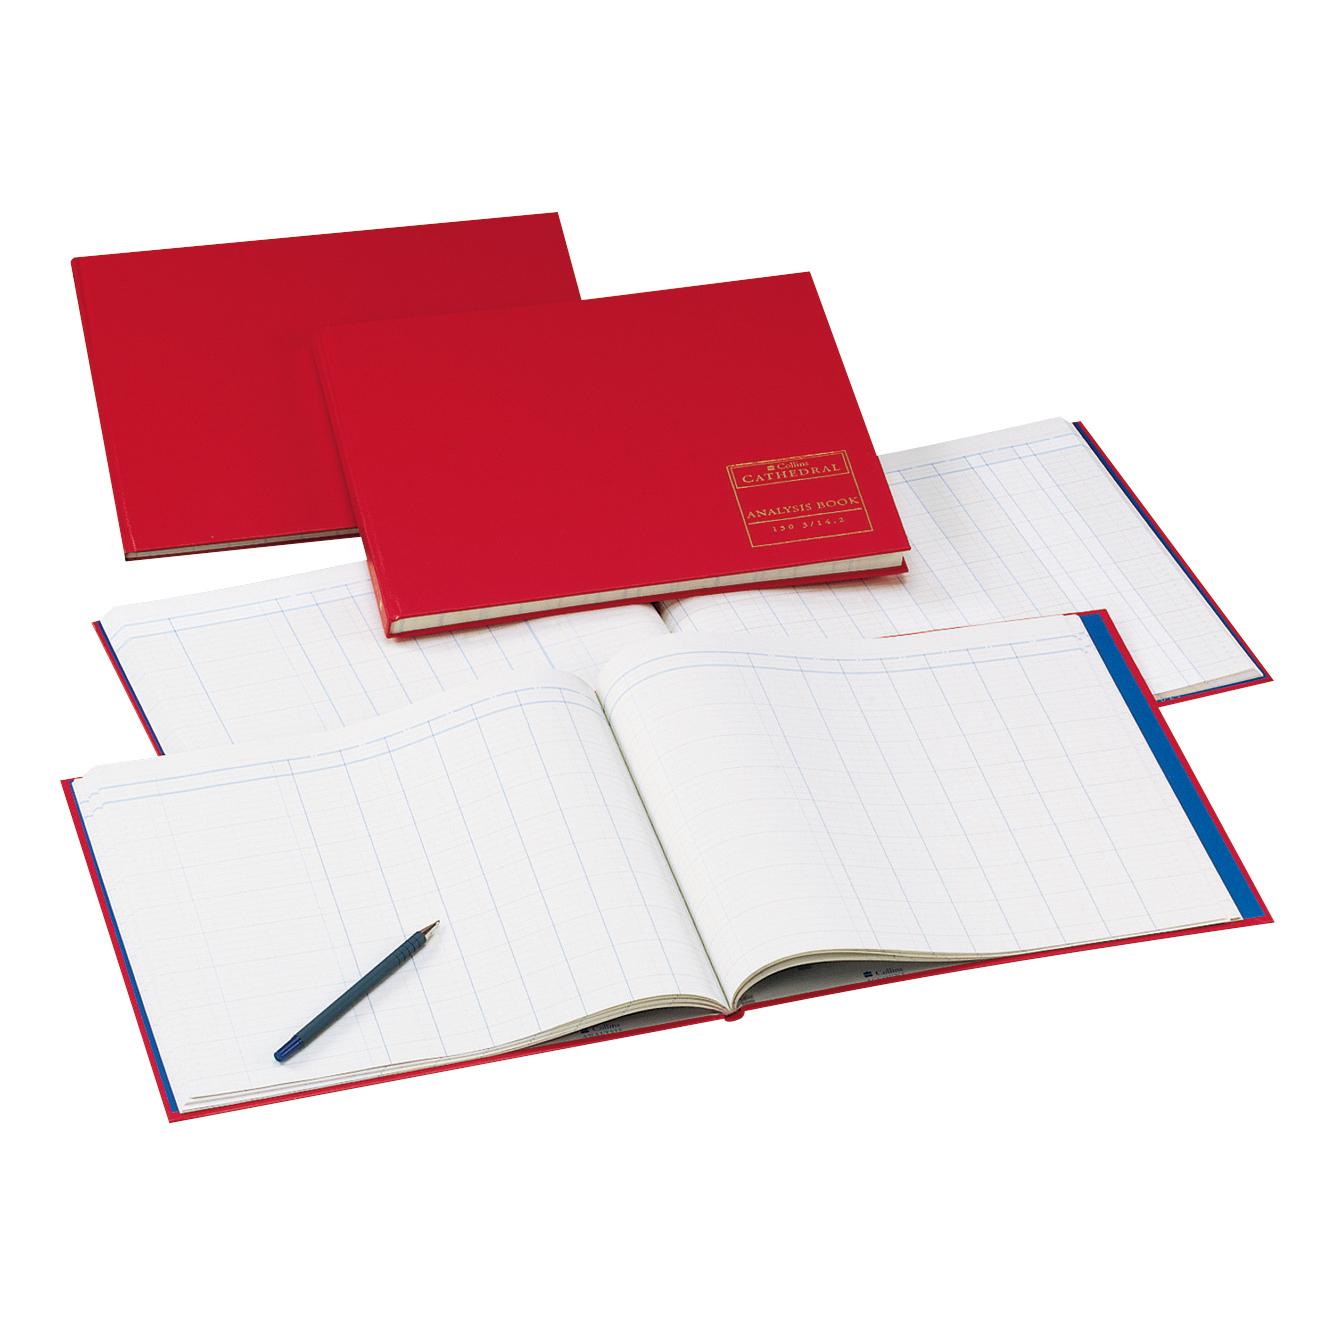 Collins 96Pg Analysis Book 150 Series 150.12.1